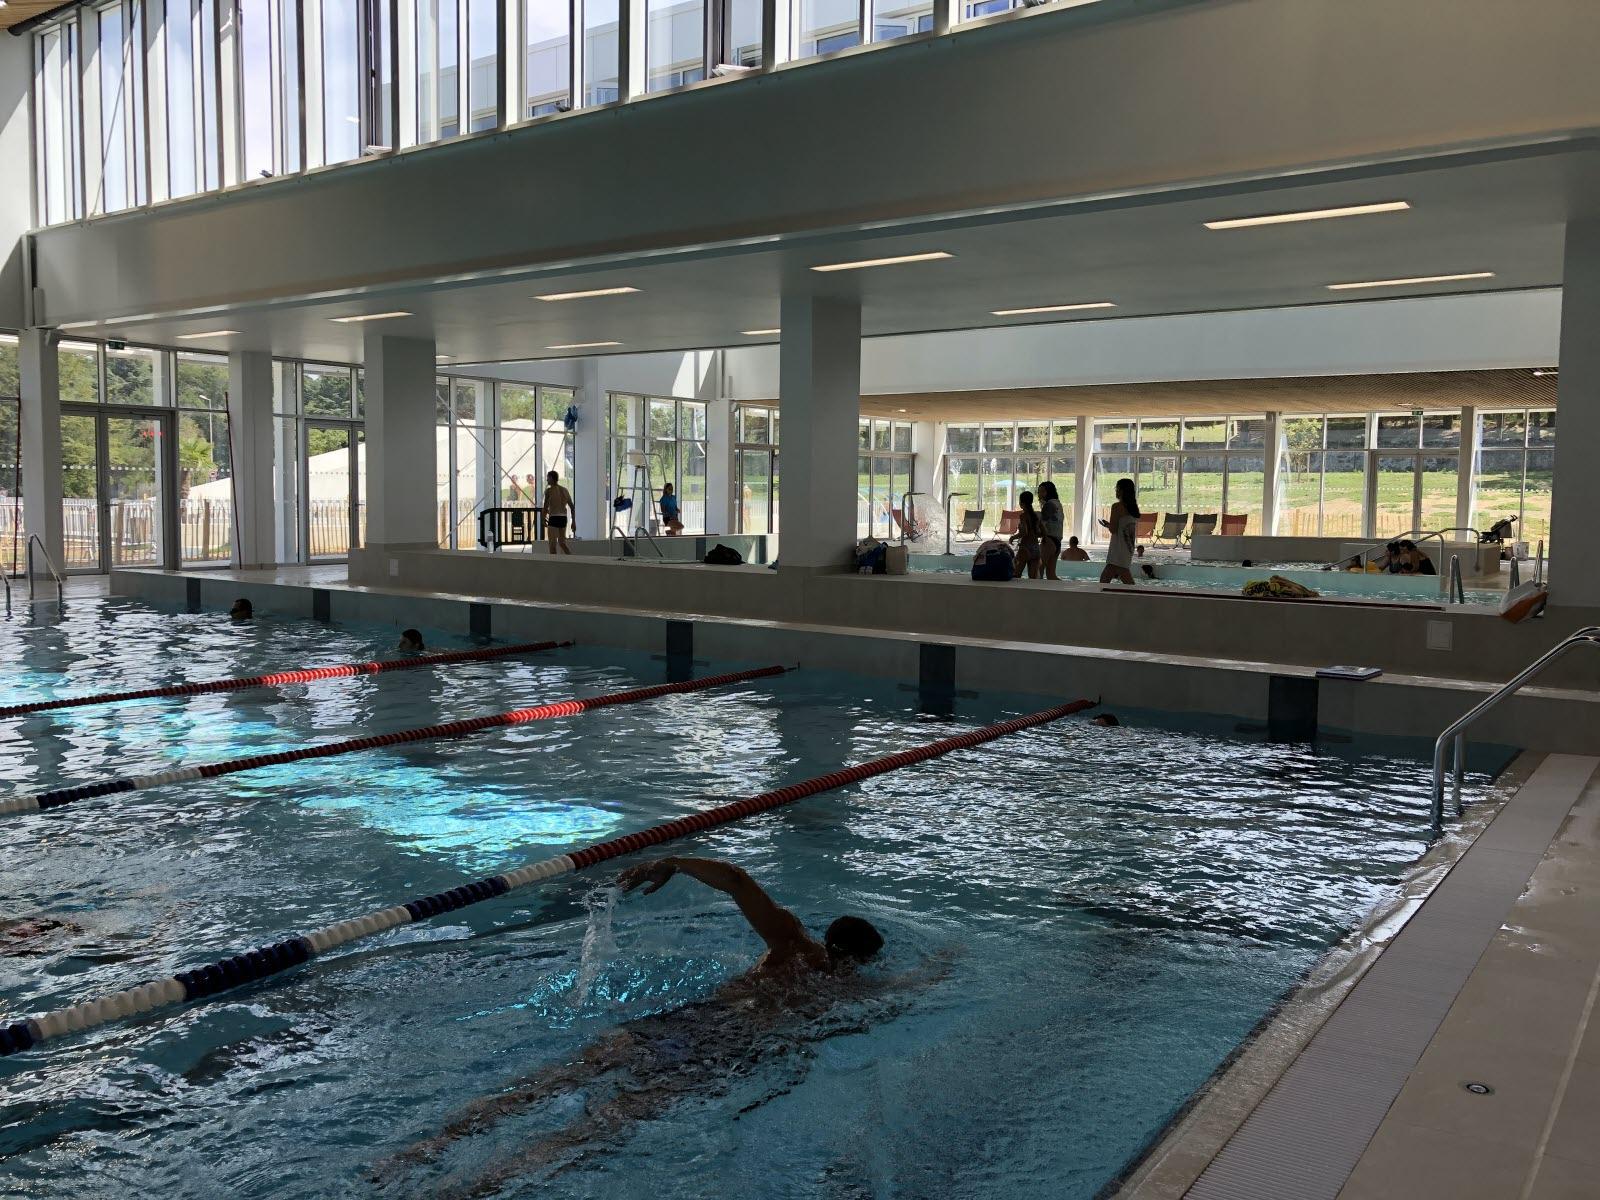 Culture - Loisirs | Annonay : Le Centre Aquatique Aquavaure ... à Piscine Annonay